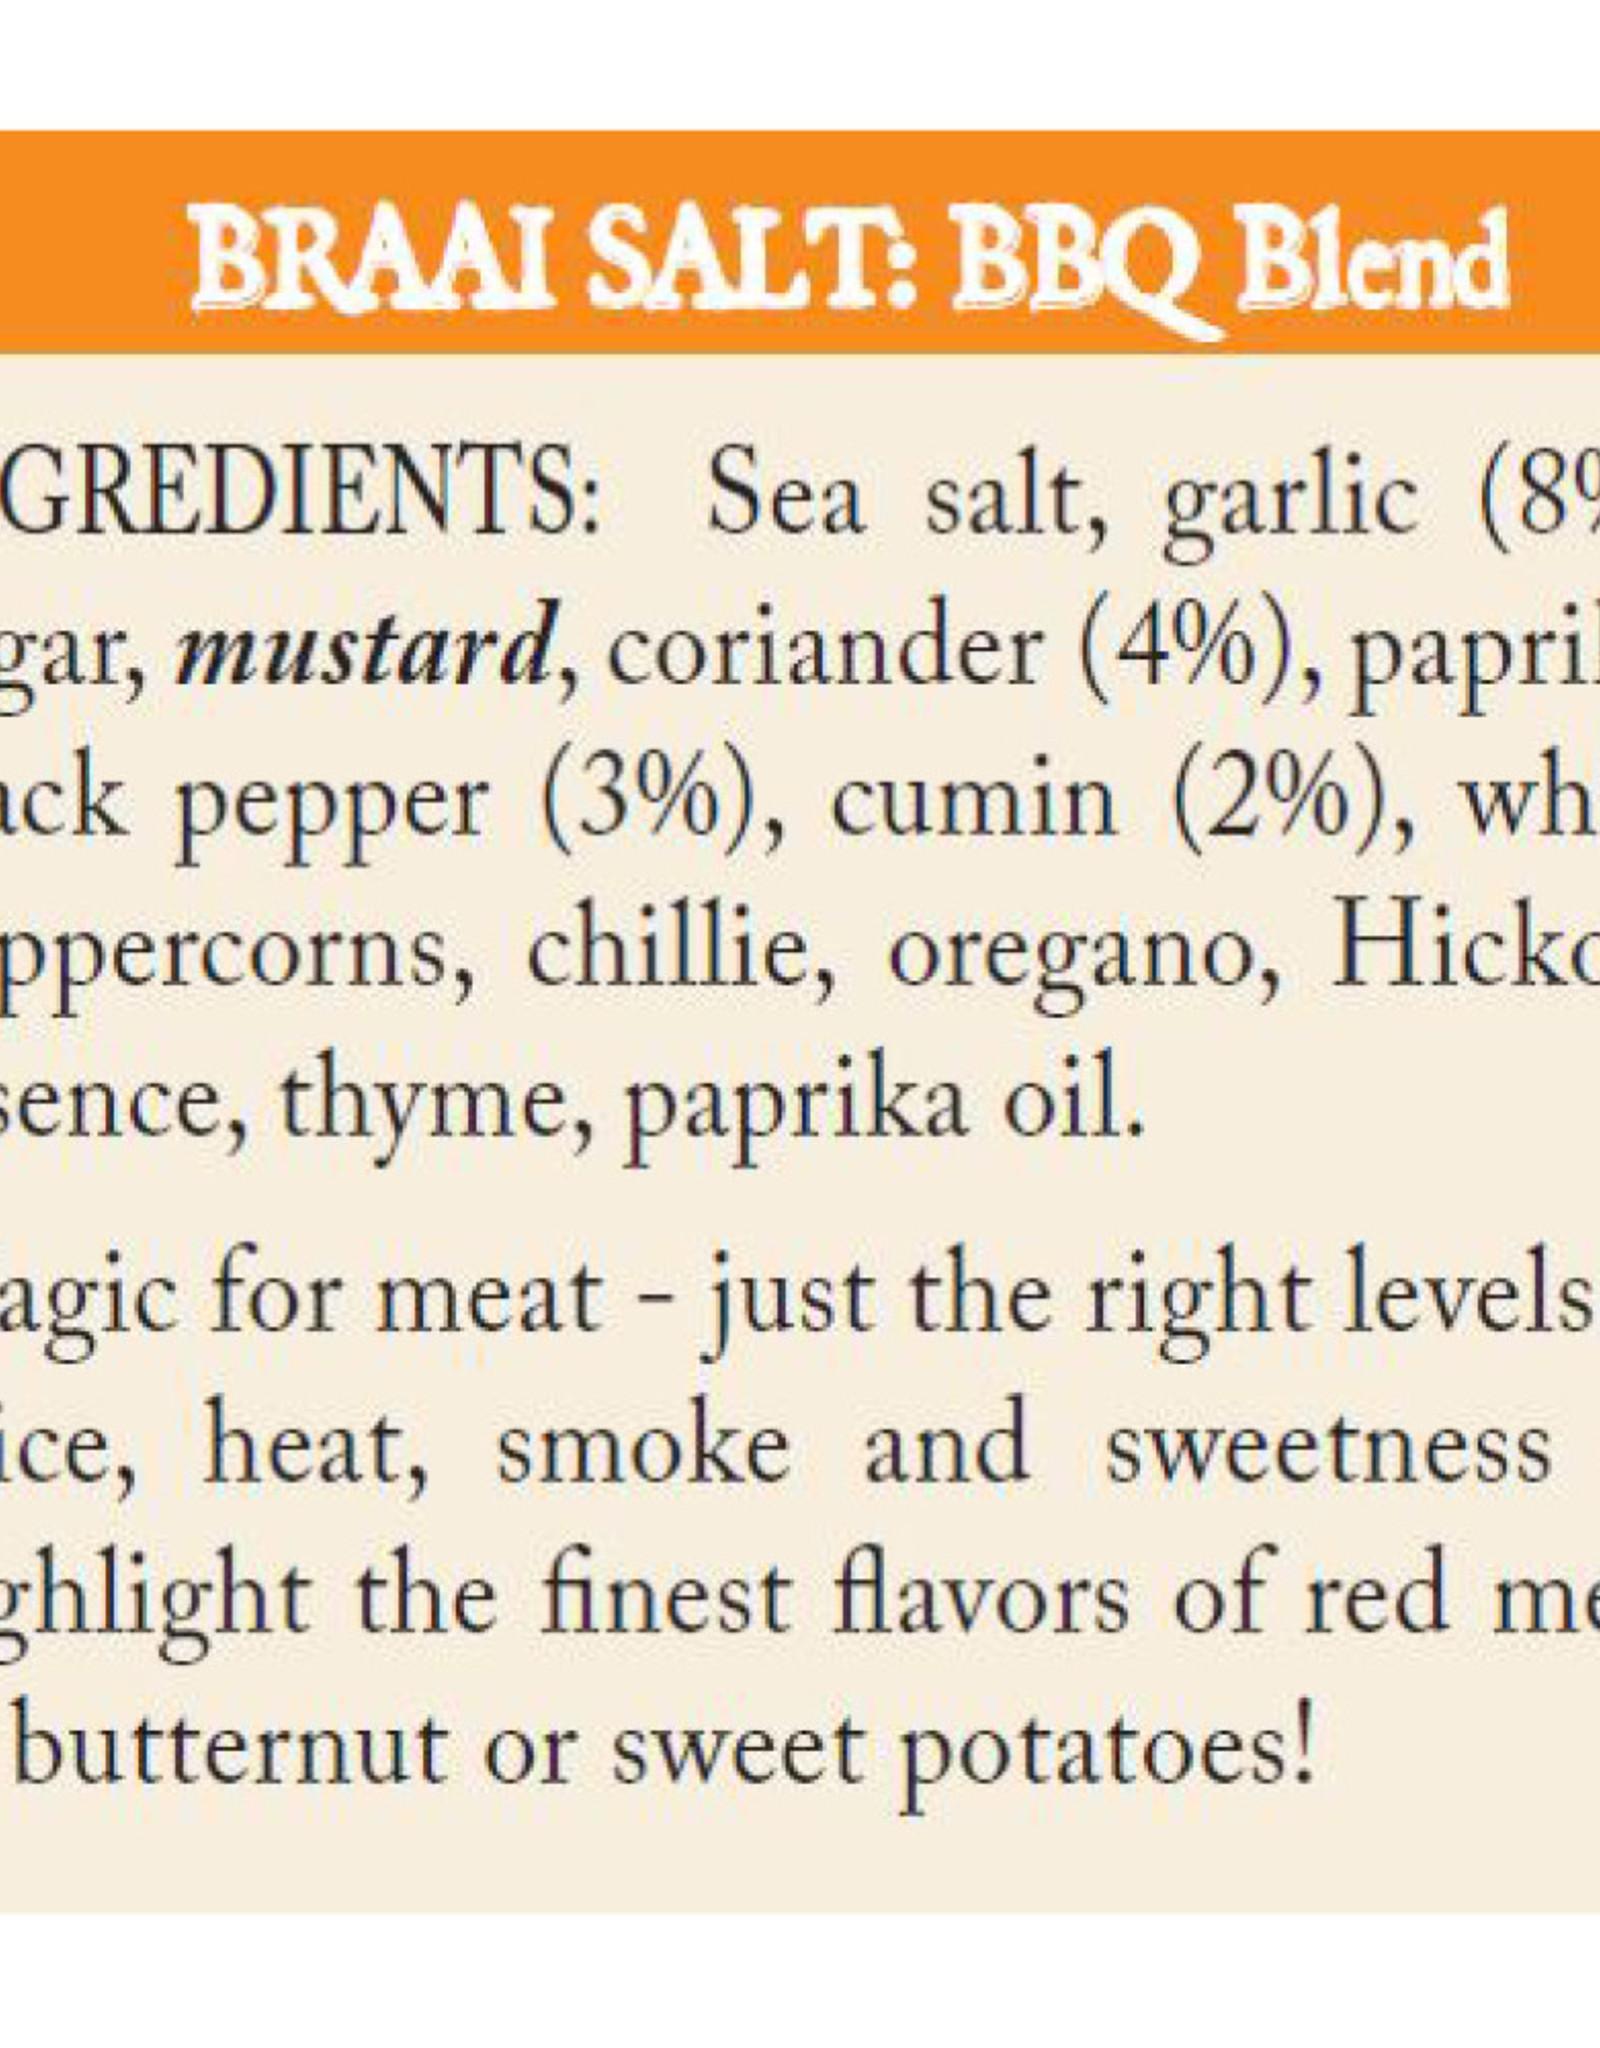 Serrv Braai Salt Blend